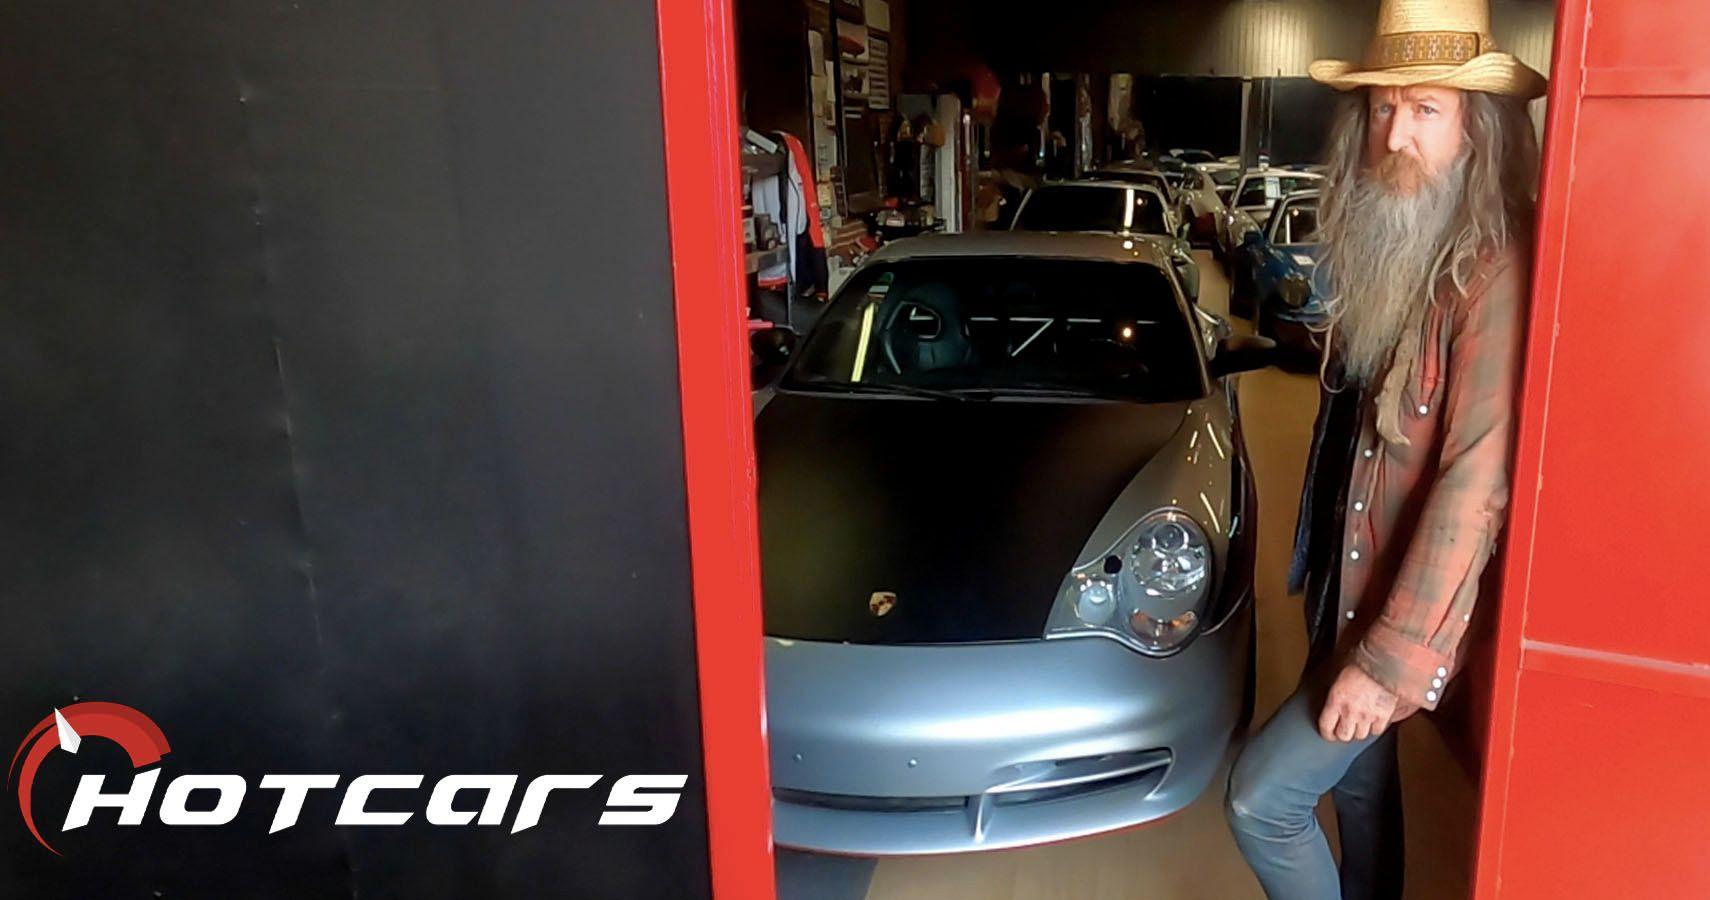 EXCLUSIVE: HotCars Checks Out Magnus Walker's Porsche 996 Collection